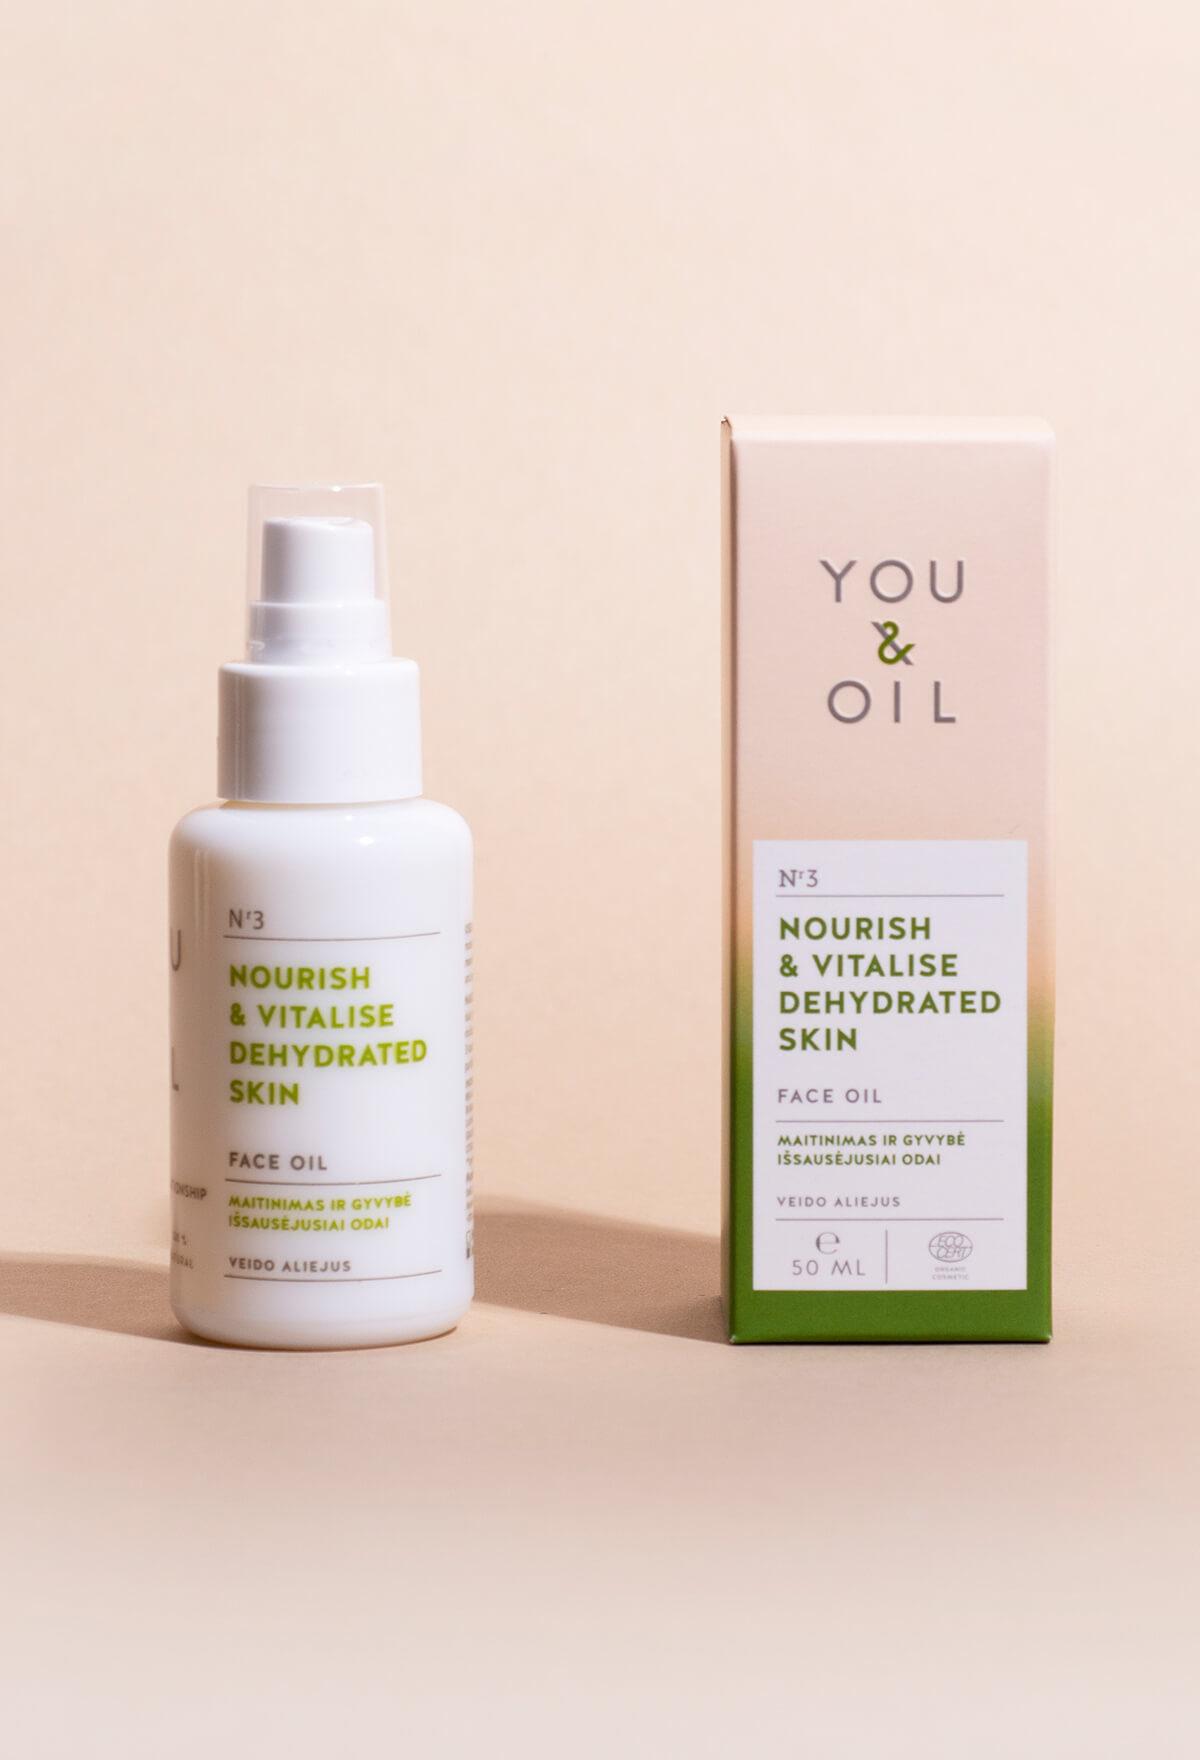 1286Nourish & Vitalise Dehydrated Skin